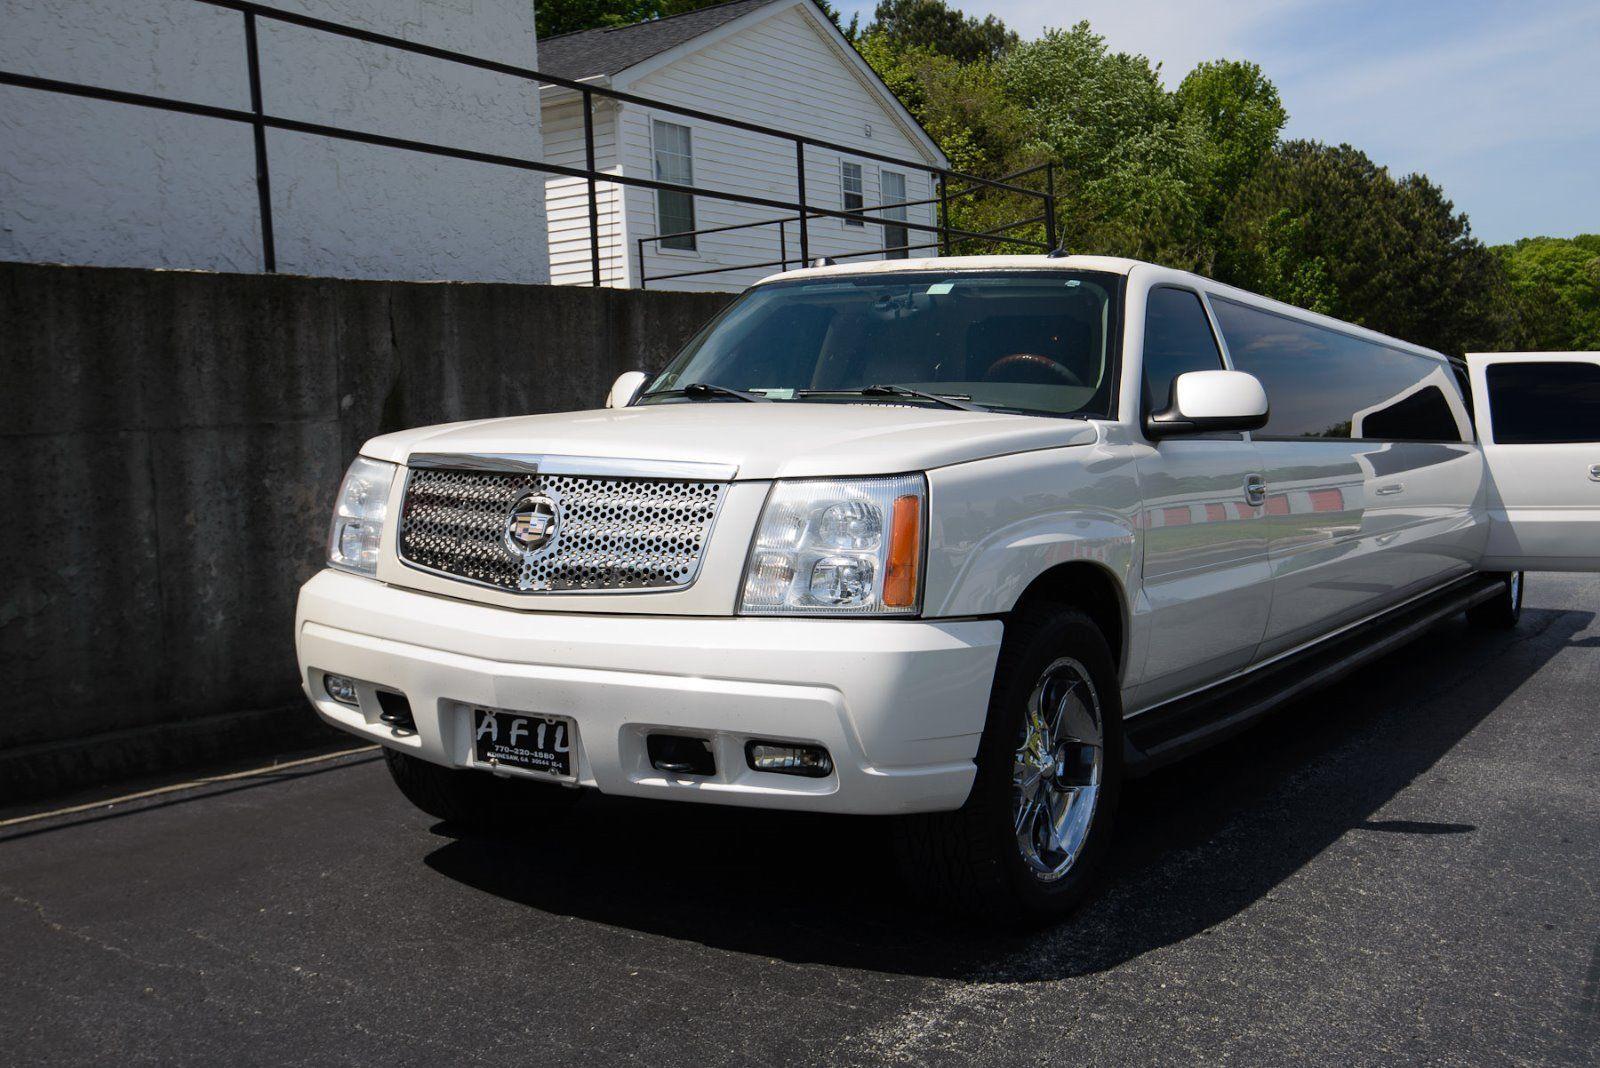 2005 cadillac escalade limousine limousines for sale cadillac rh pinterest com